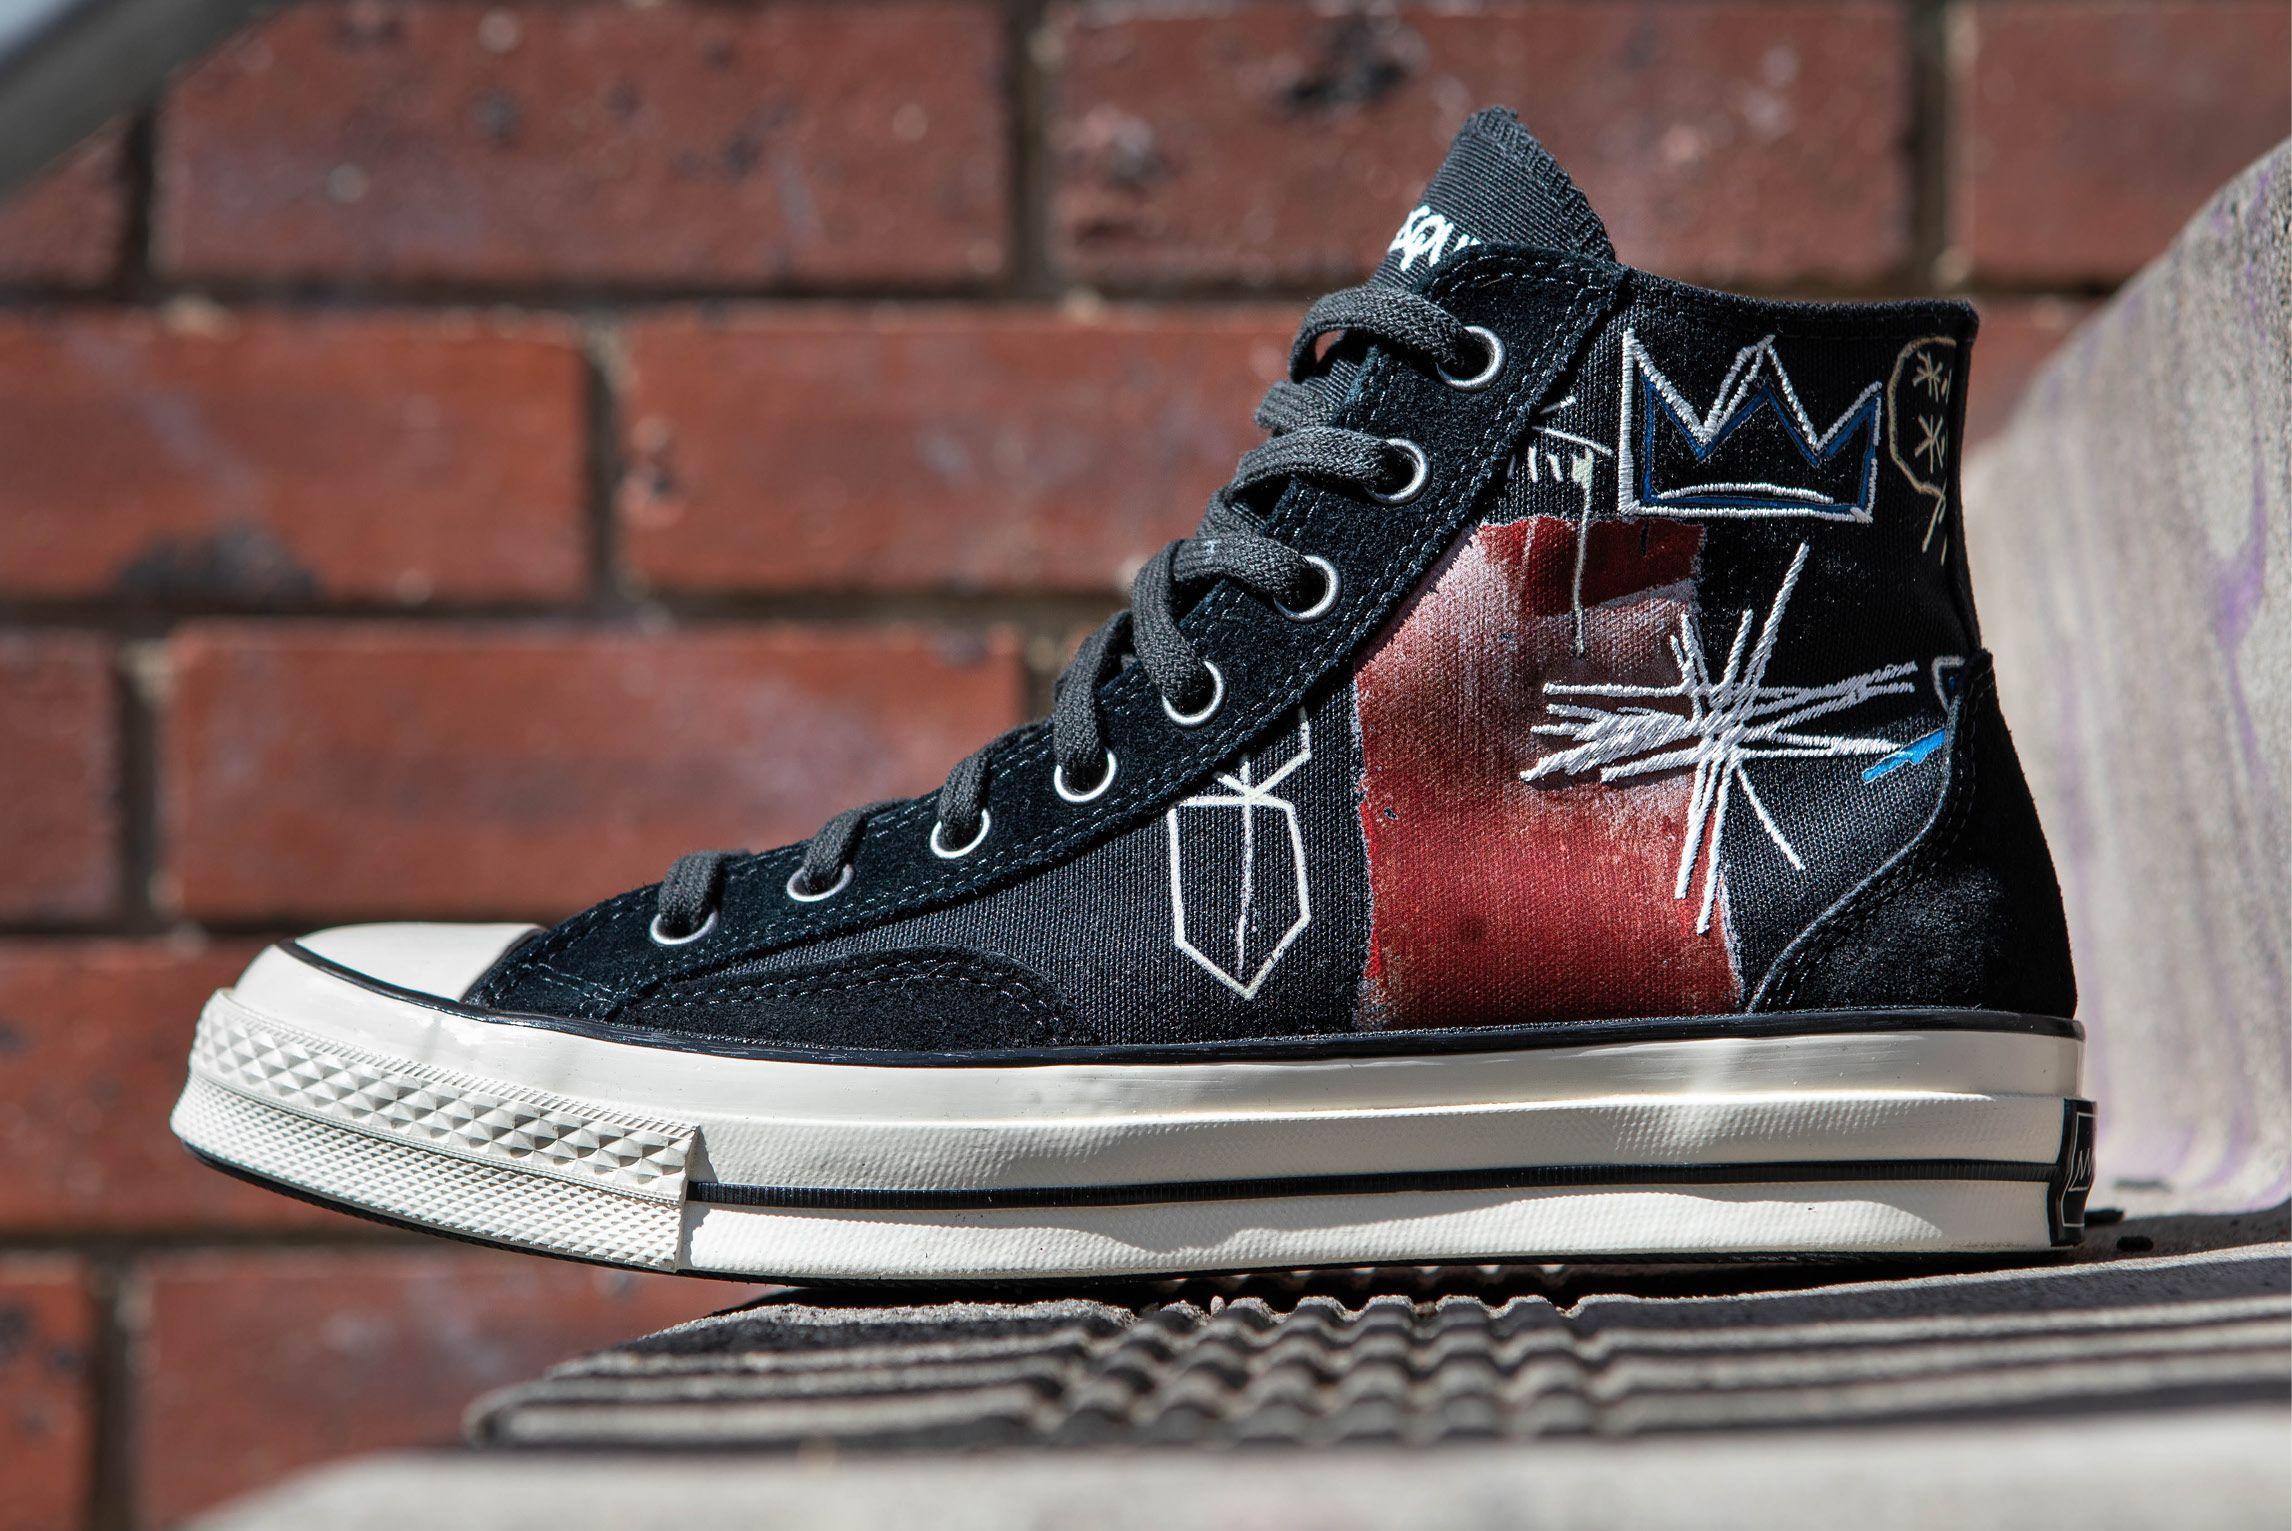 Jean-Michel Basquiat x Converse Chuck 70